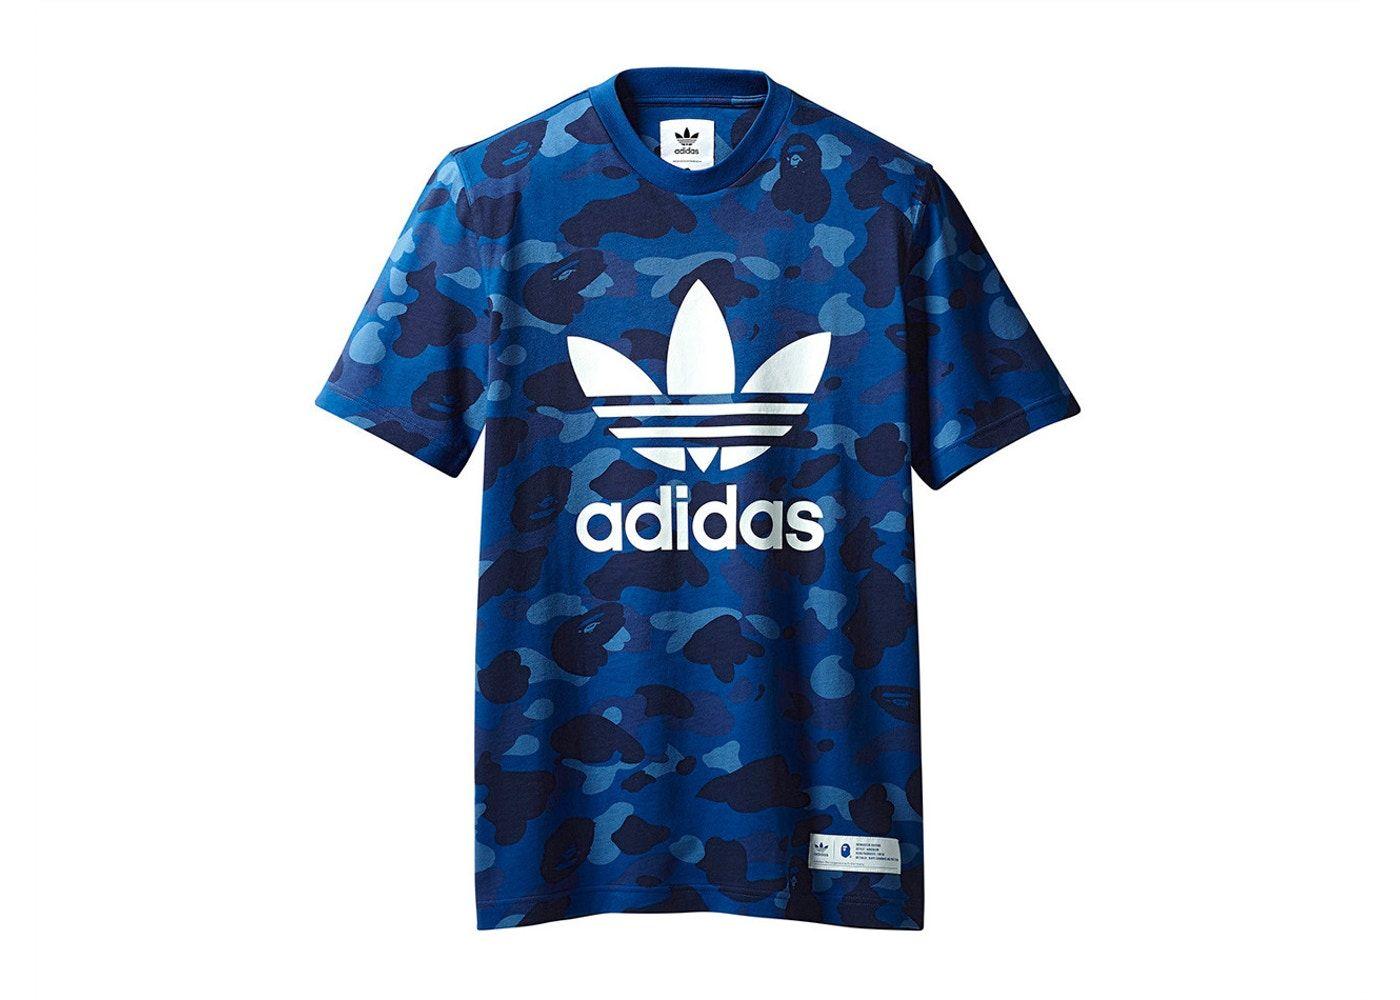 d69253a5 BAPE x adidas adicolor Tee Blue in 2019 | shose | Bape shirt, Adidas ...